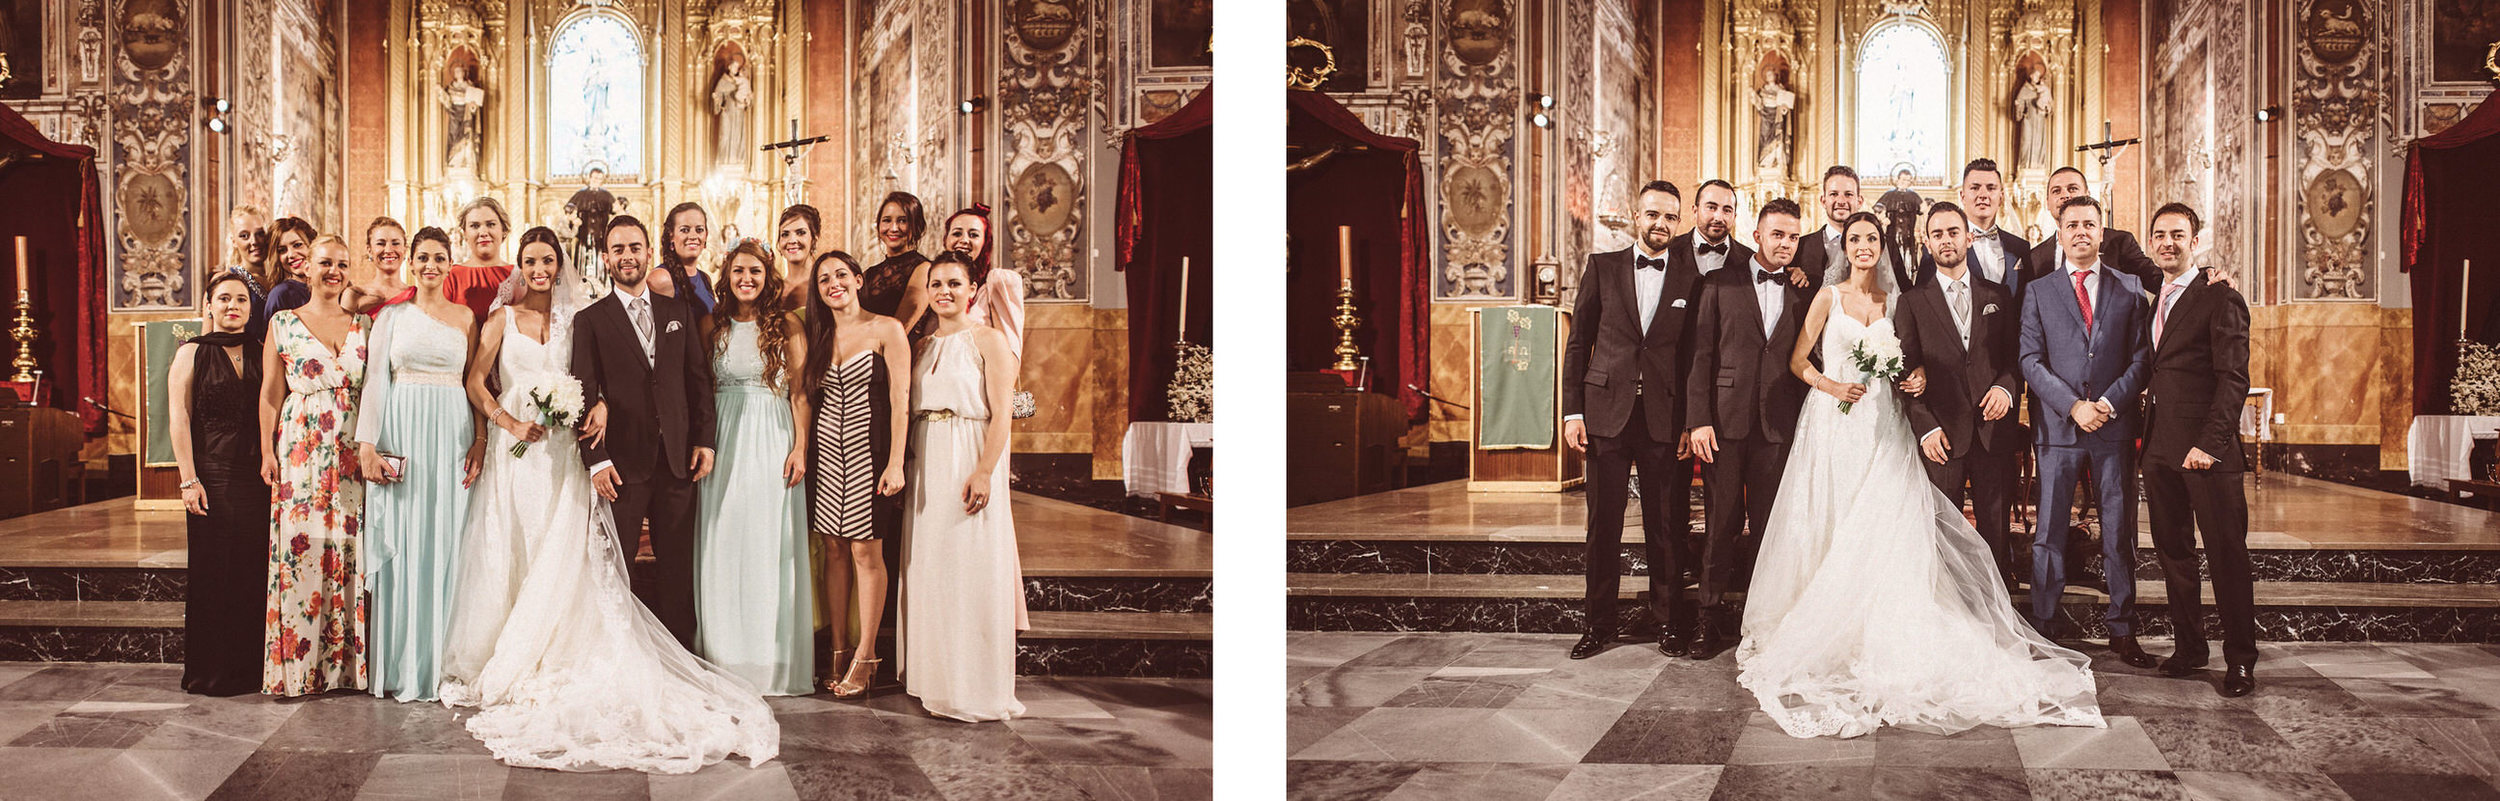 boda en utrera doble igl2.jpg